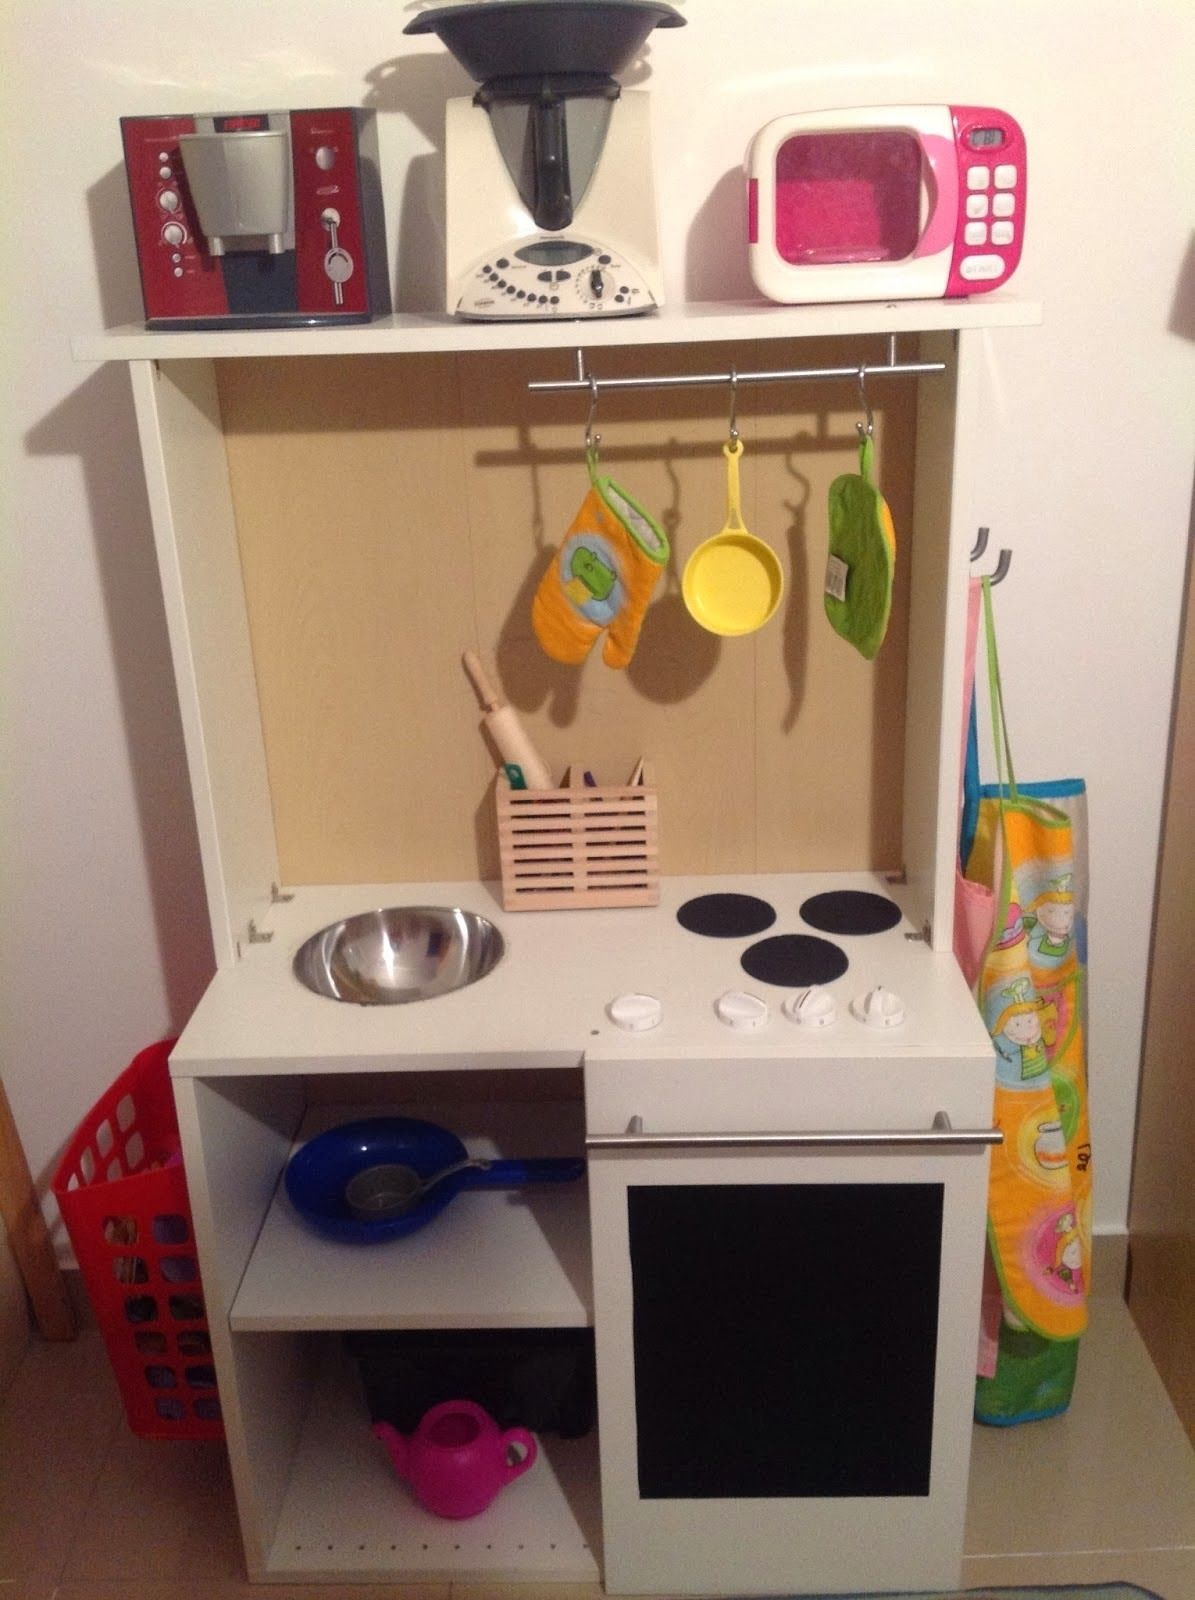 Mi llave allen una cocina de juguete en un mueble faktum for Ikea juguetes infantiles